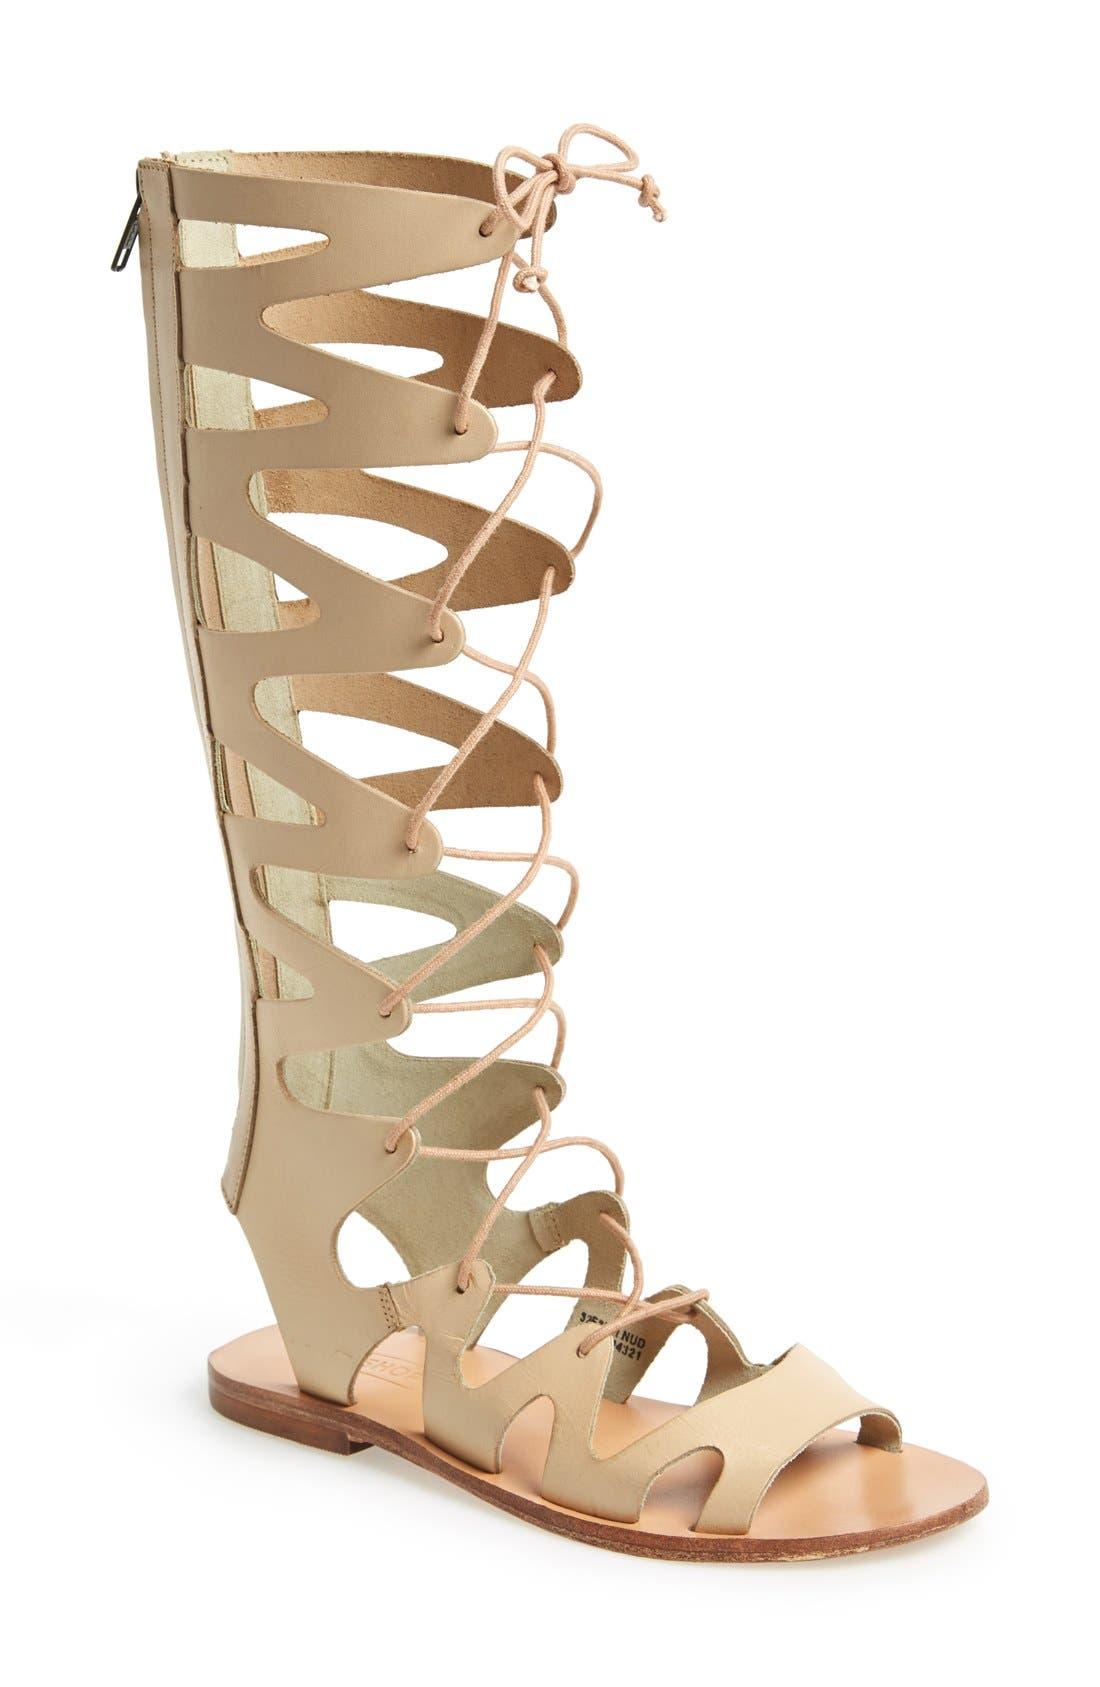 Alternate Image 1 Selected - Topshop 'Figtree' Leather Gladiator Sandal (Women)